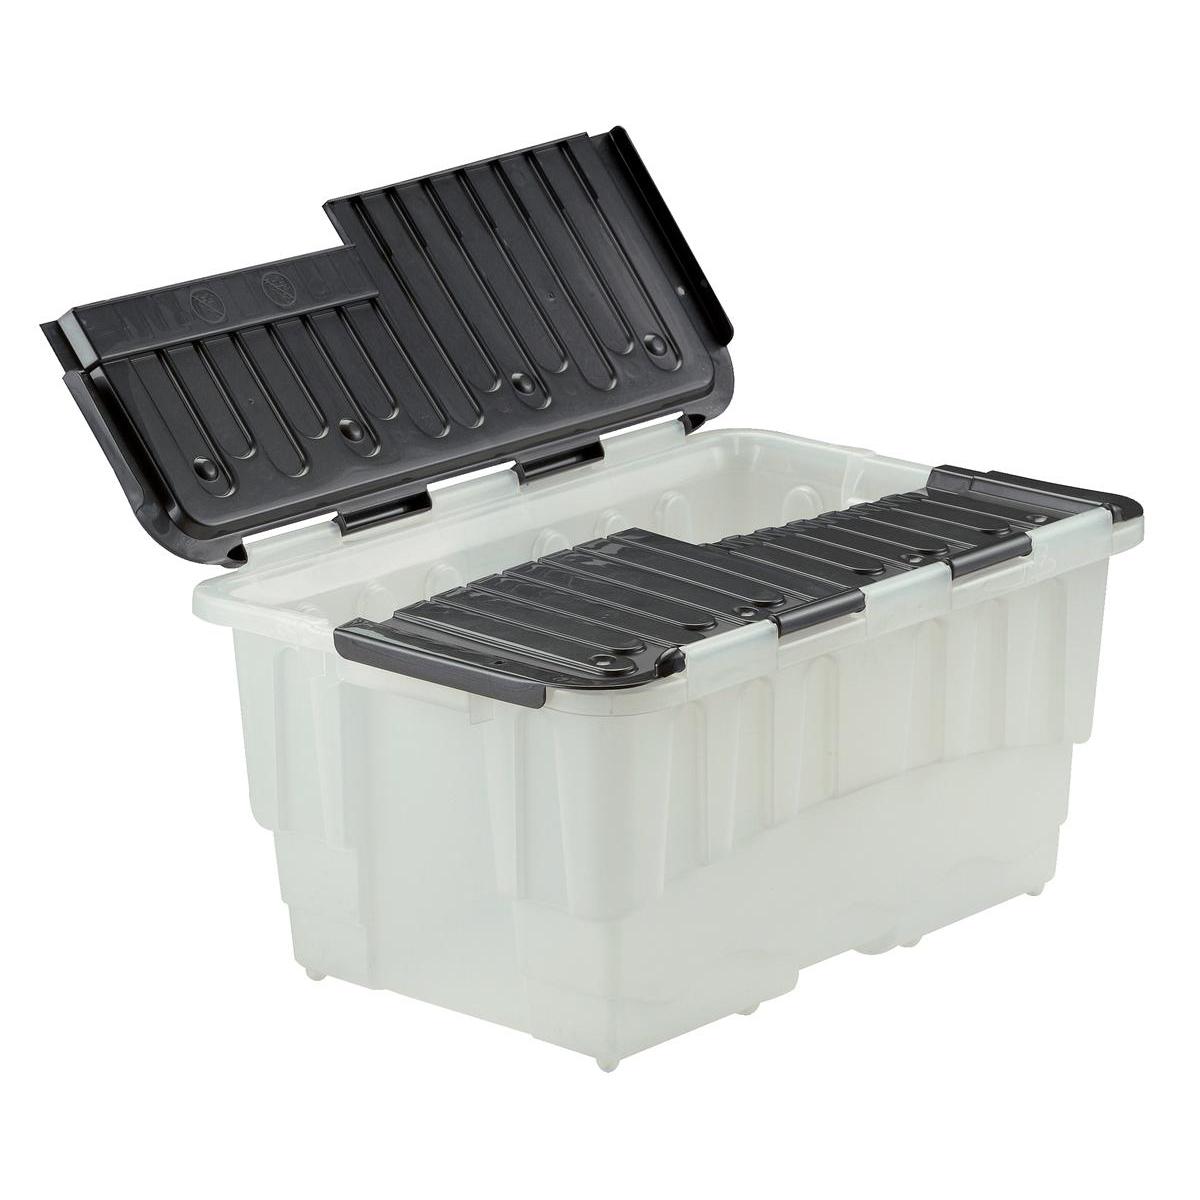 Strata Storage Box Duracrate Crate Plastic 40 Litre W570xH390xH290mm Black Ref HW390BLK Pack 5